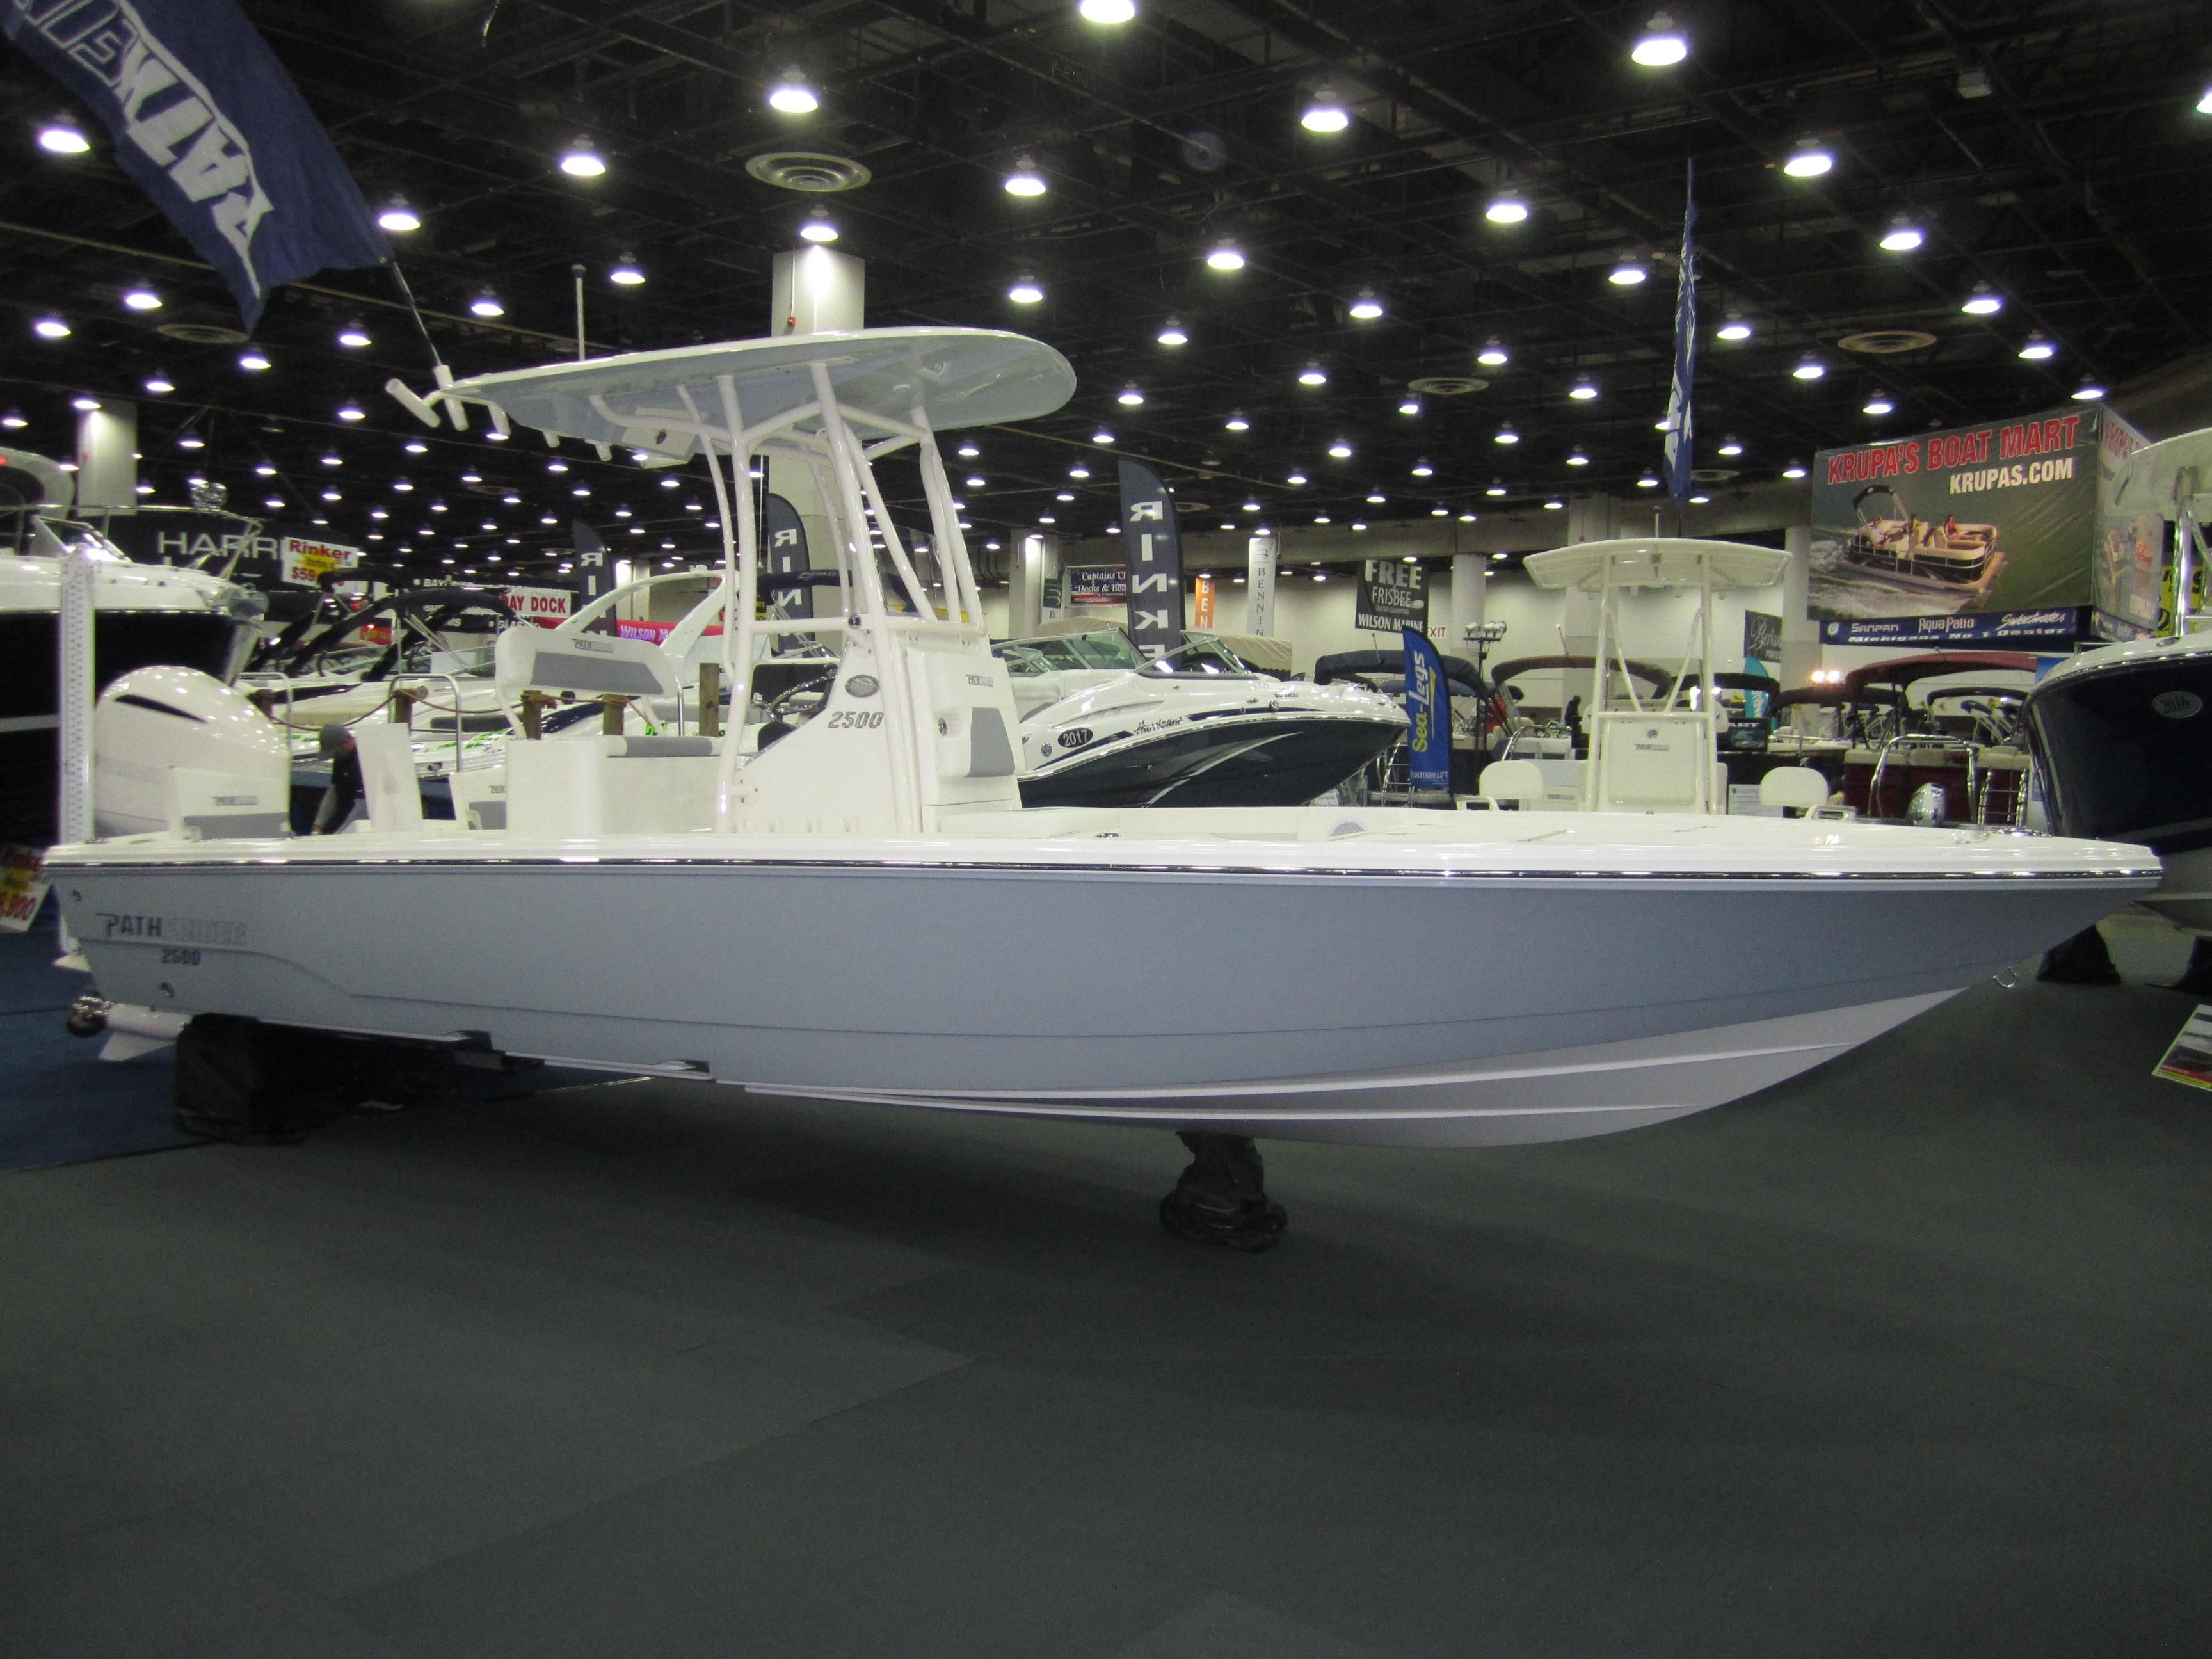 Mercury Outboard Dealers >> 2018 Pathfinder 2500 Hybrid Power Boat For Sale - www.yachtworld.com